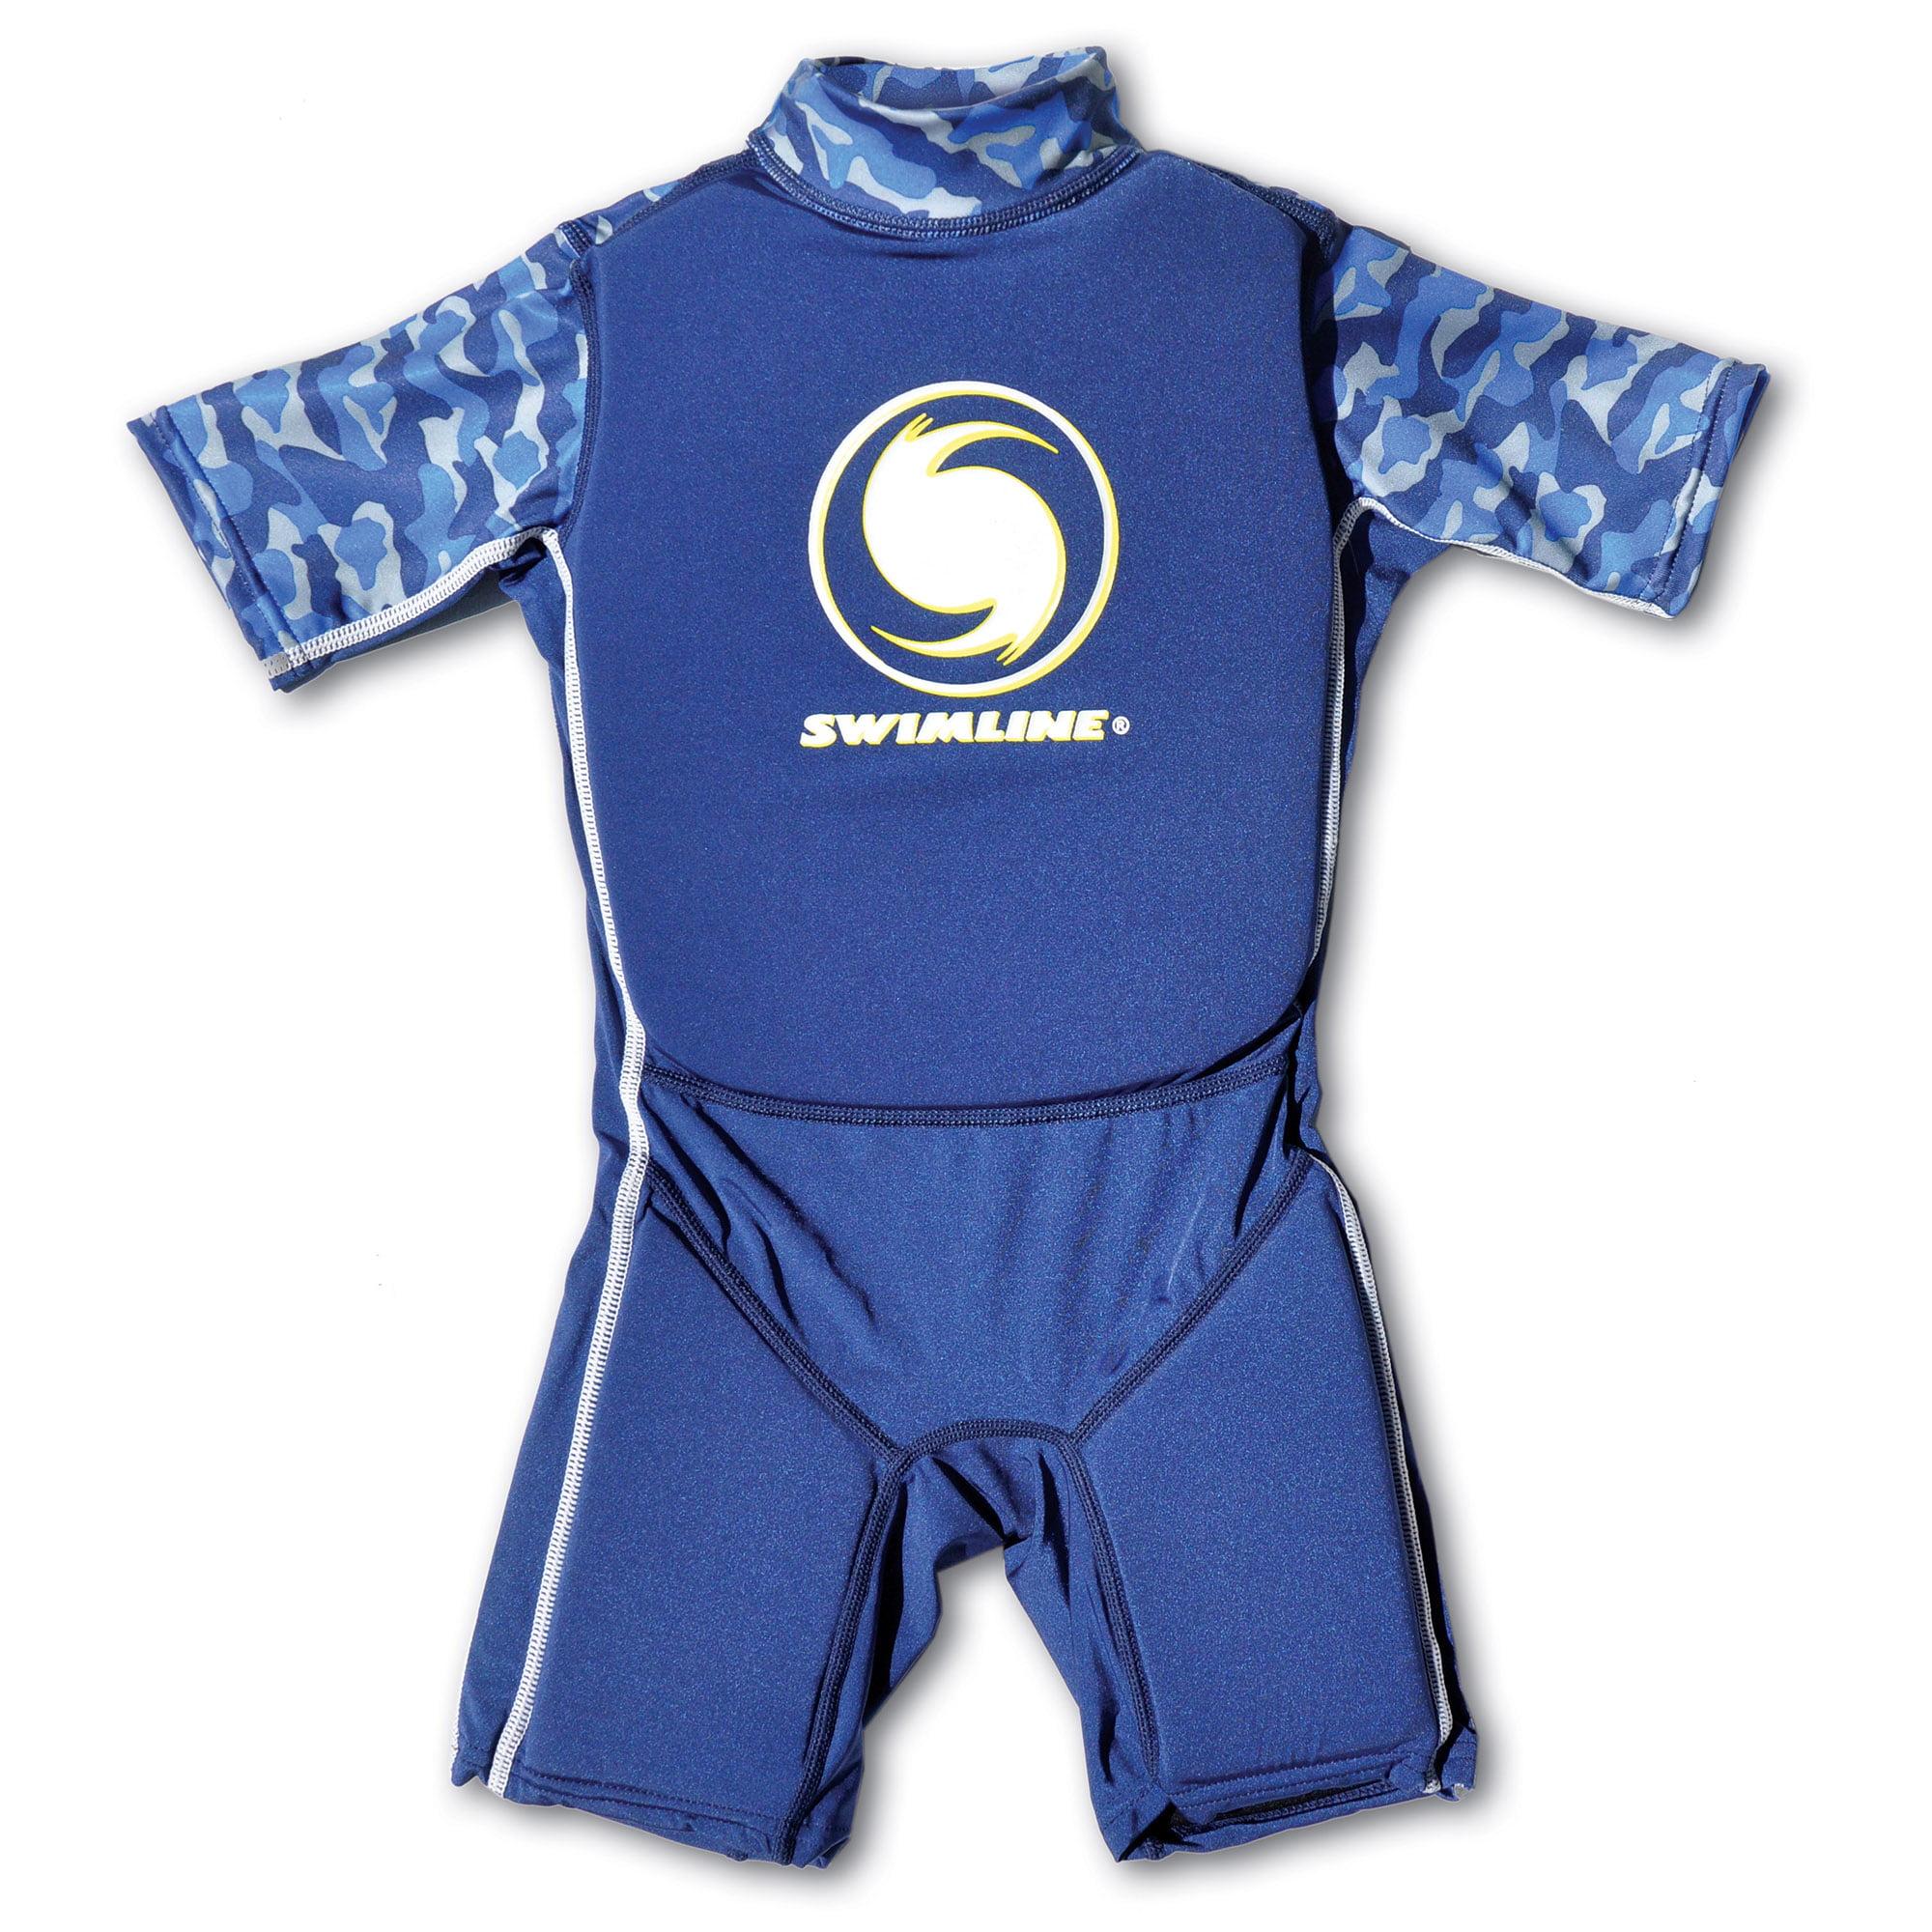 Swimline Blue Lycra Boy's Floating Swim Trainer Wet Suit Life Vest Small 9892B by Swimline